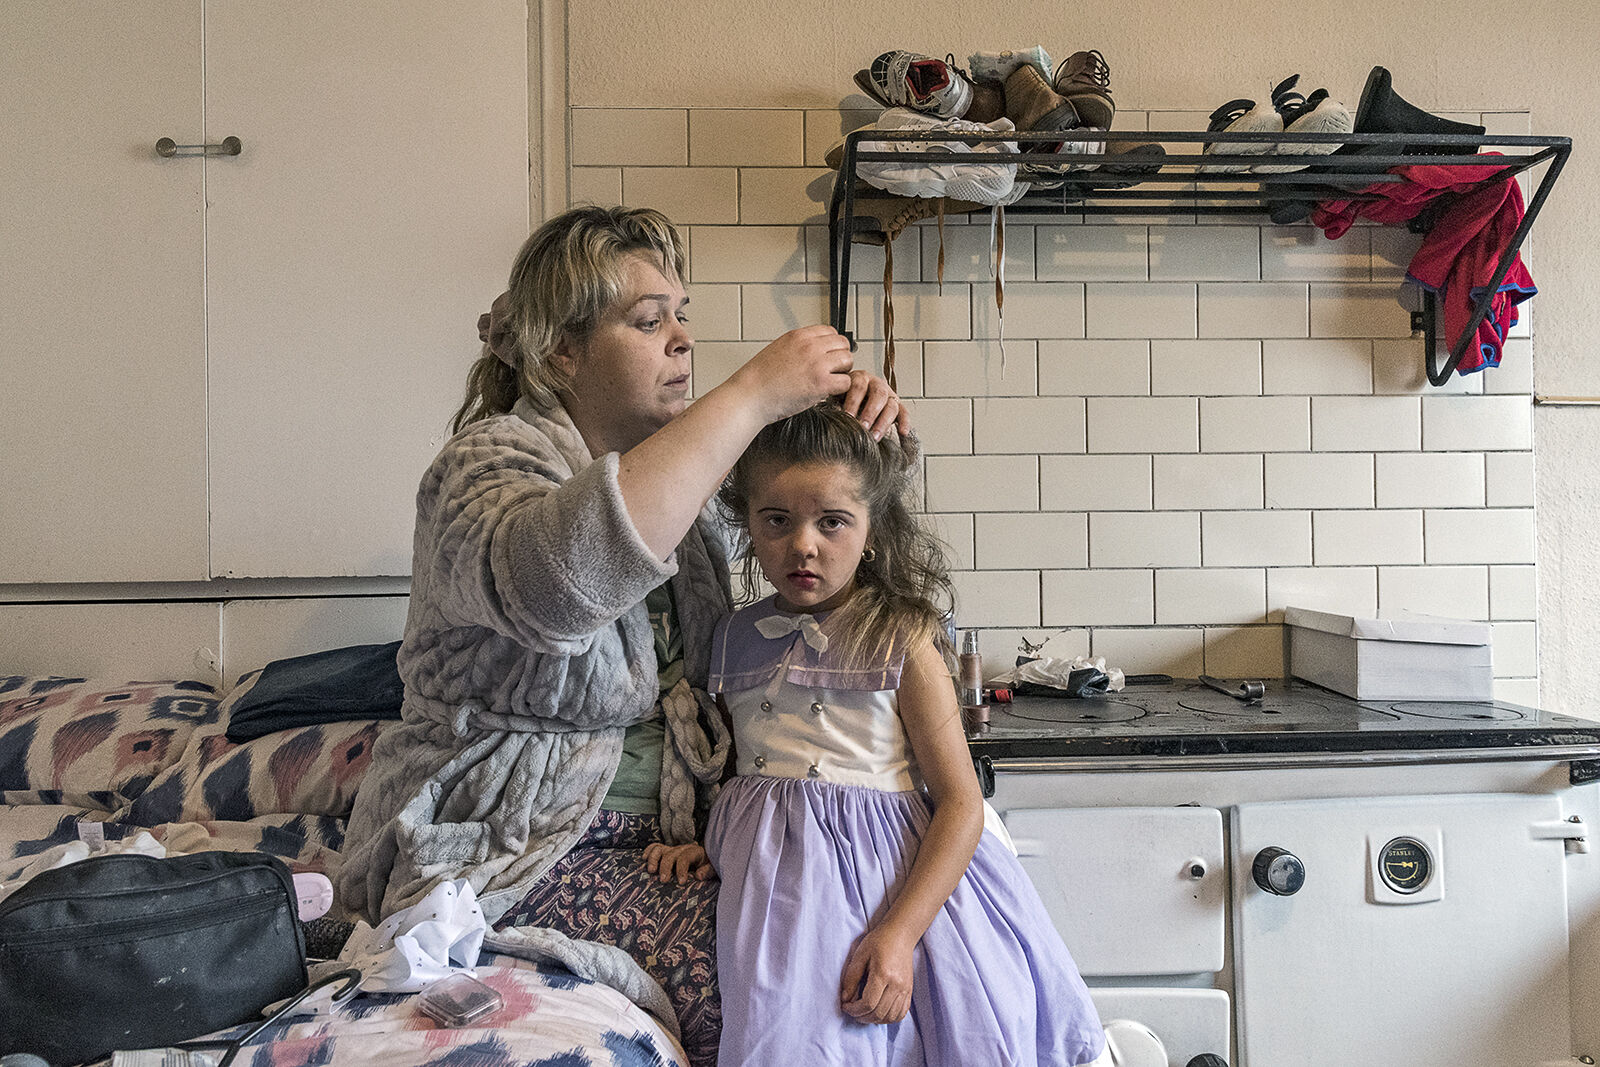 Geraldine fixing Leanne's Hair, Galway, Ireland 2020